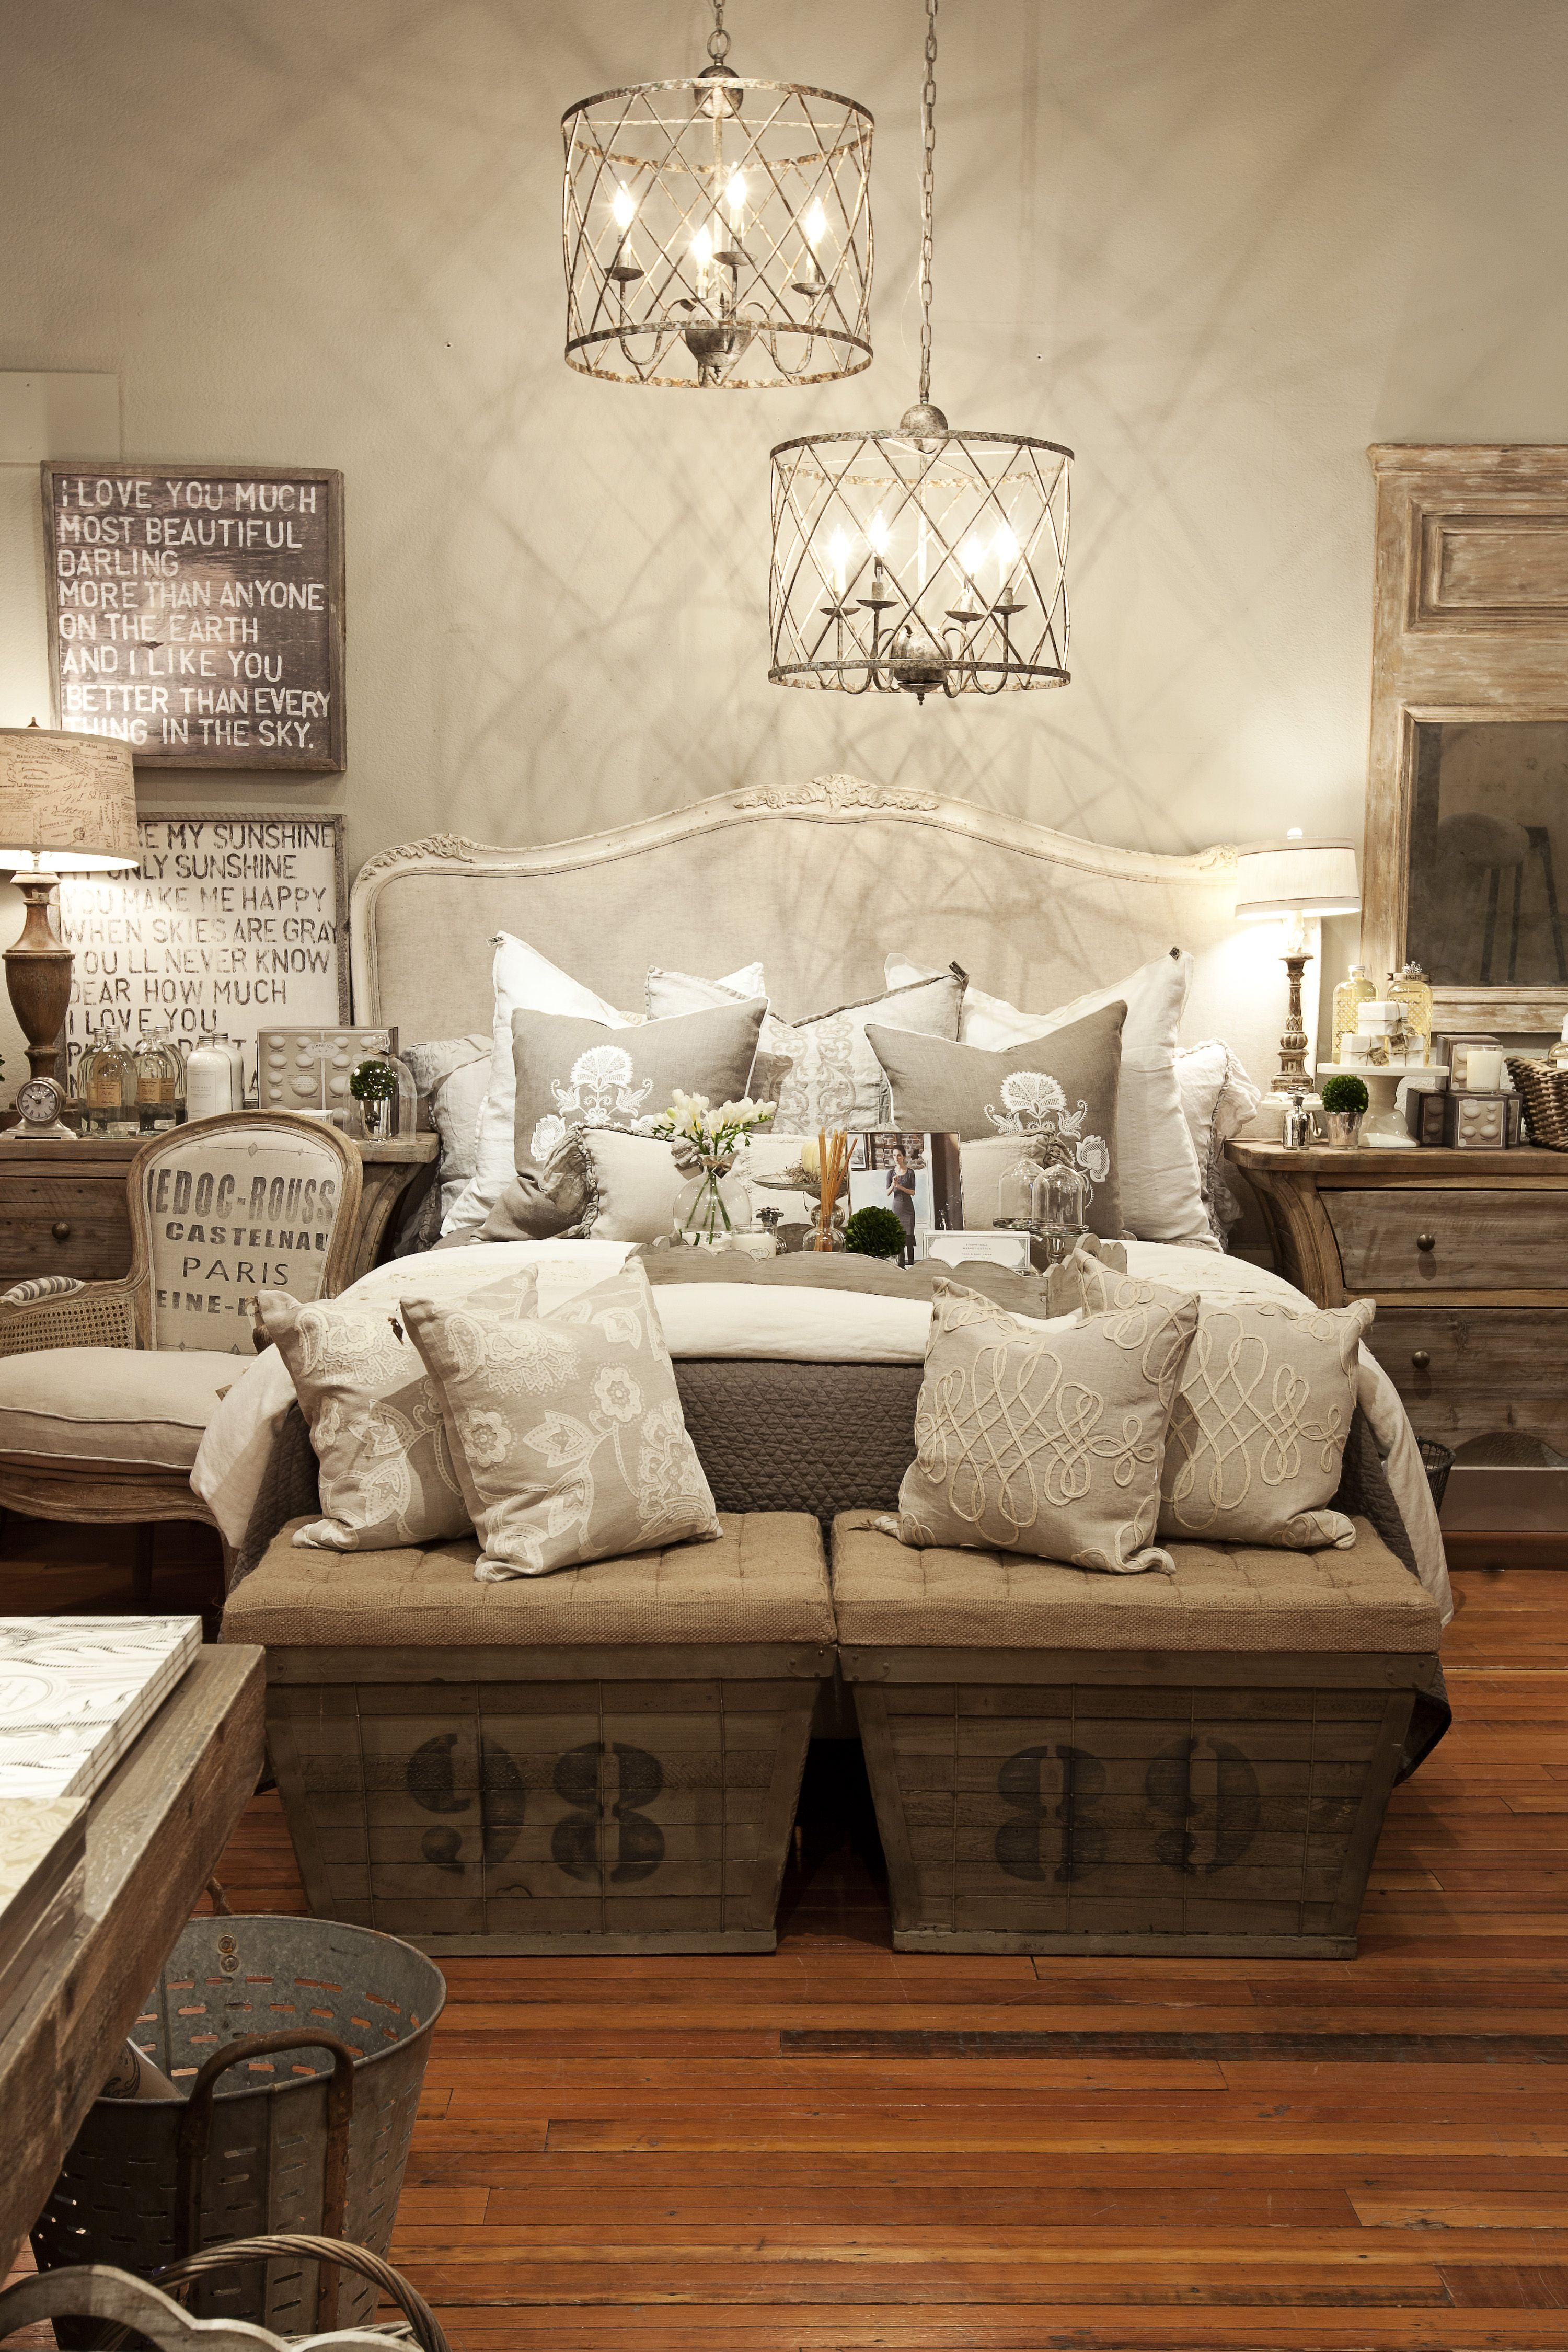 Bedroom inspired industrial style bedroom inspiration pinterest